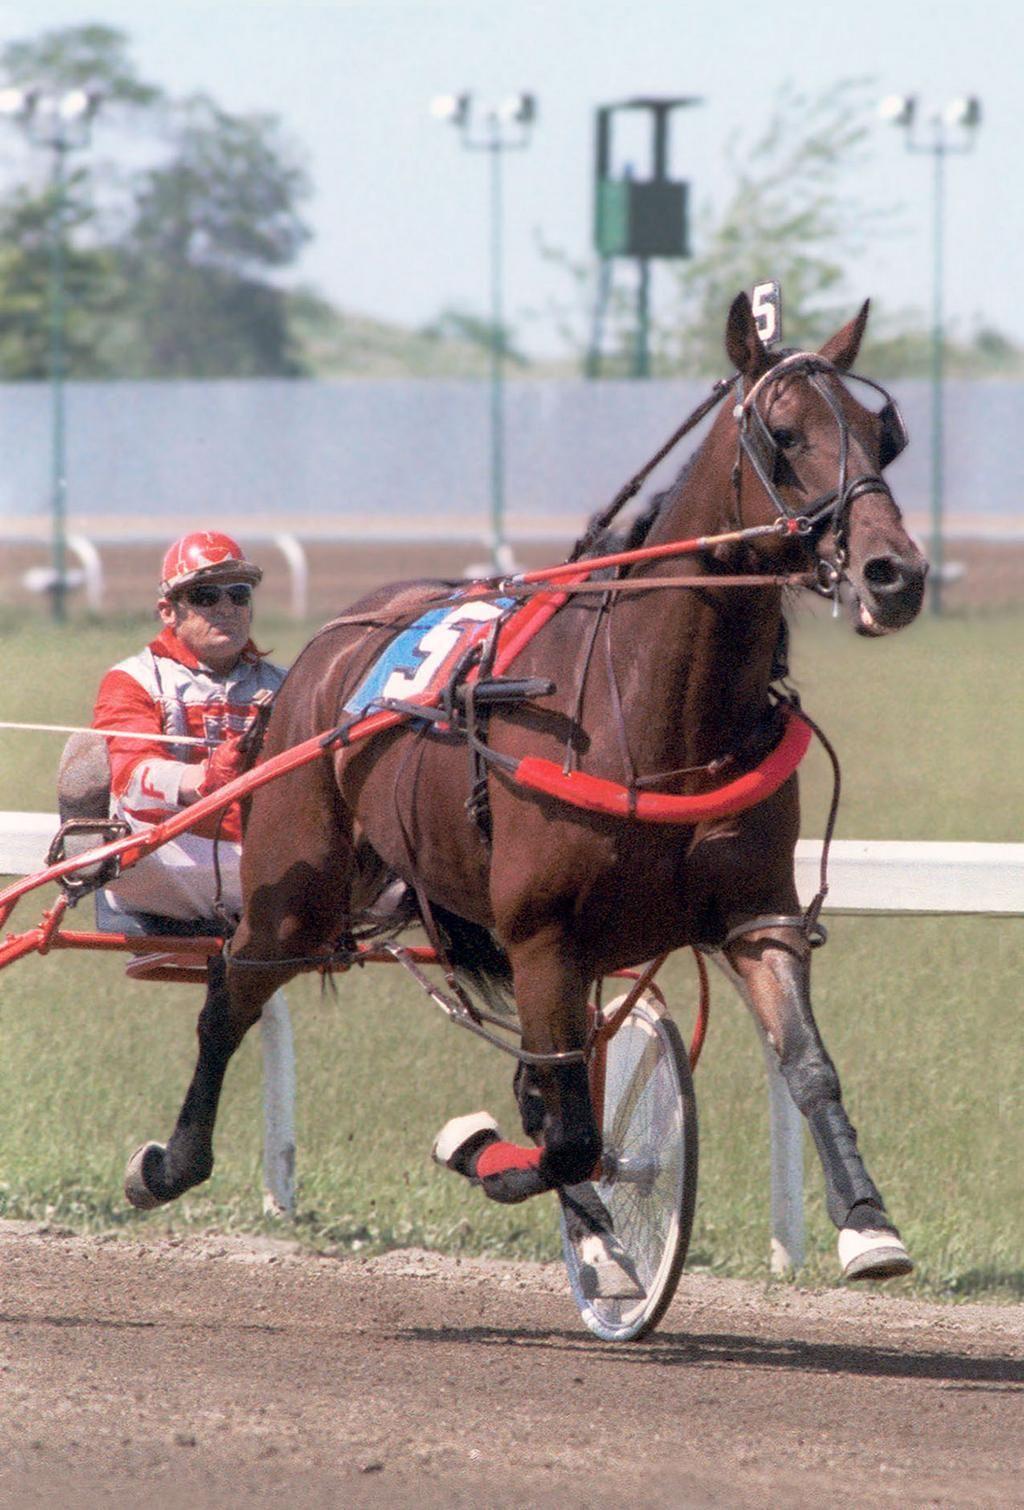 U.S. Trotting Assn. on Animals, Horses, Harness racing